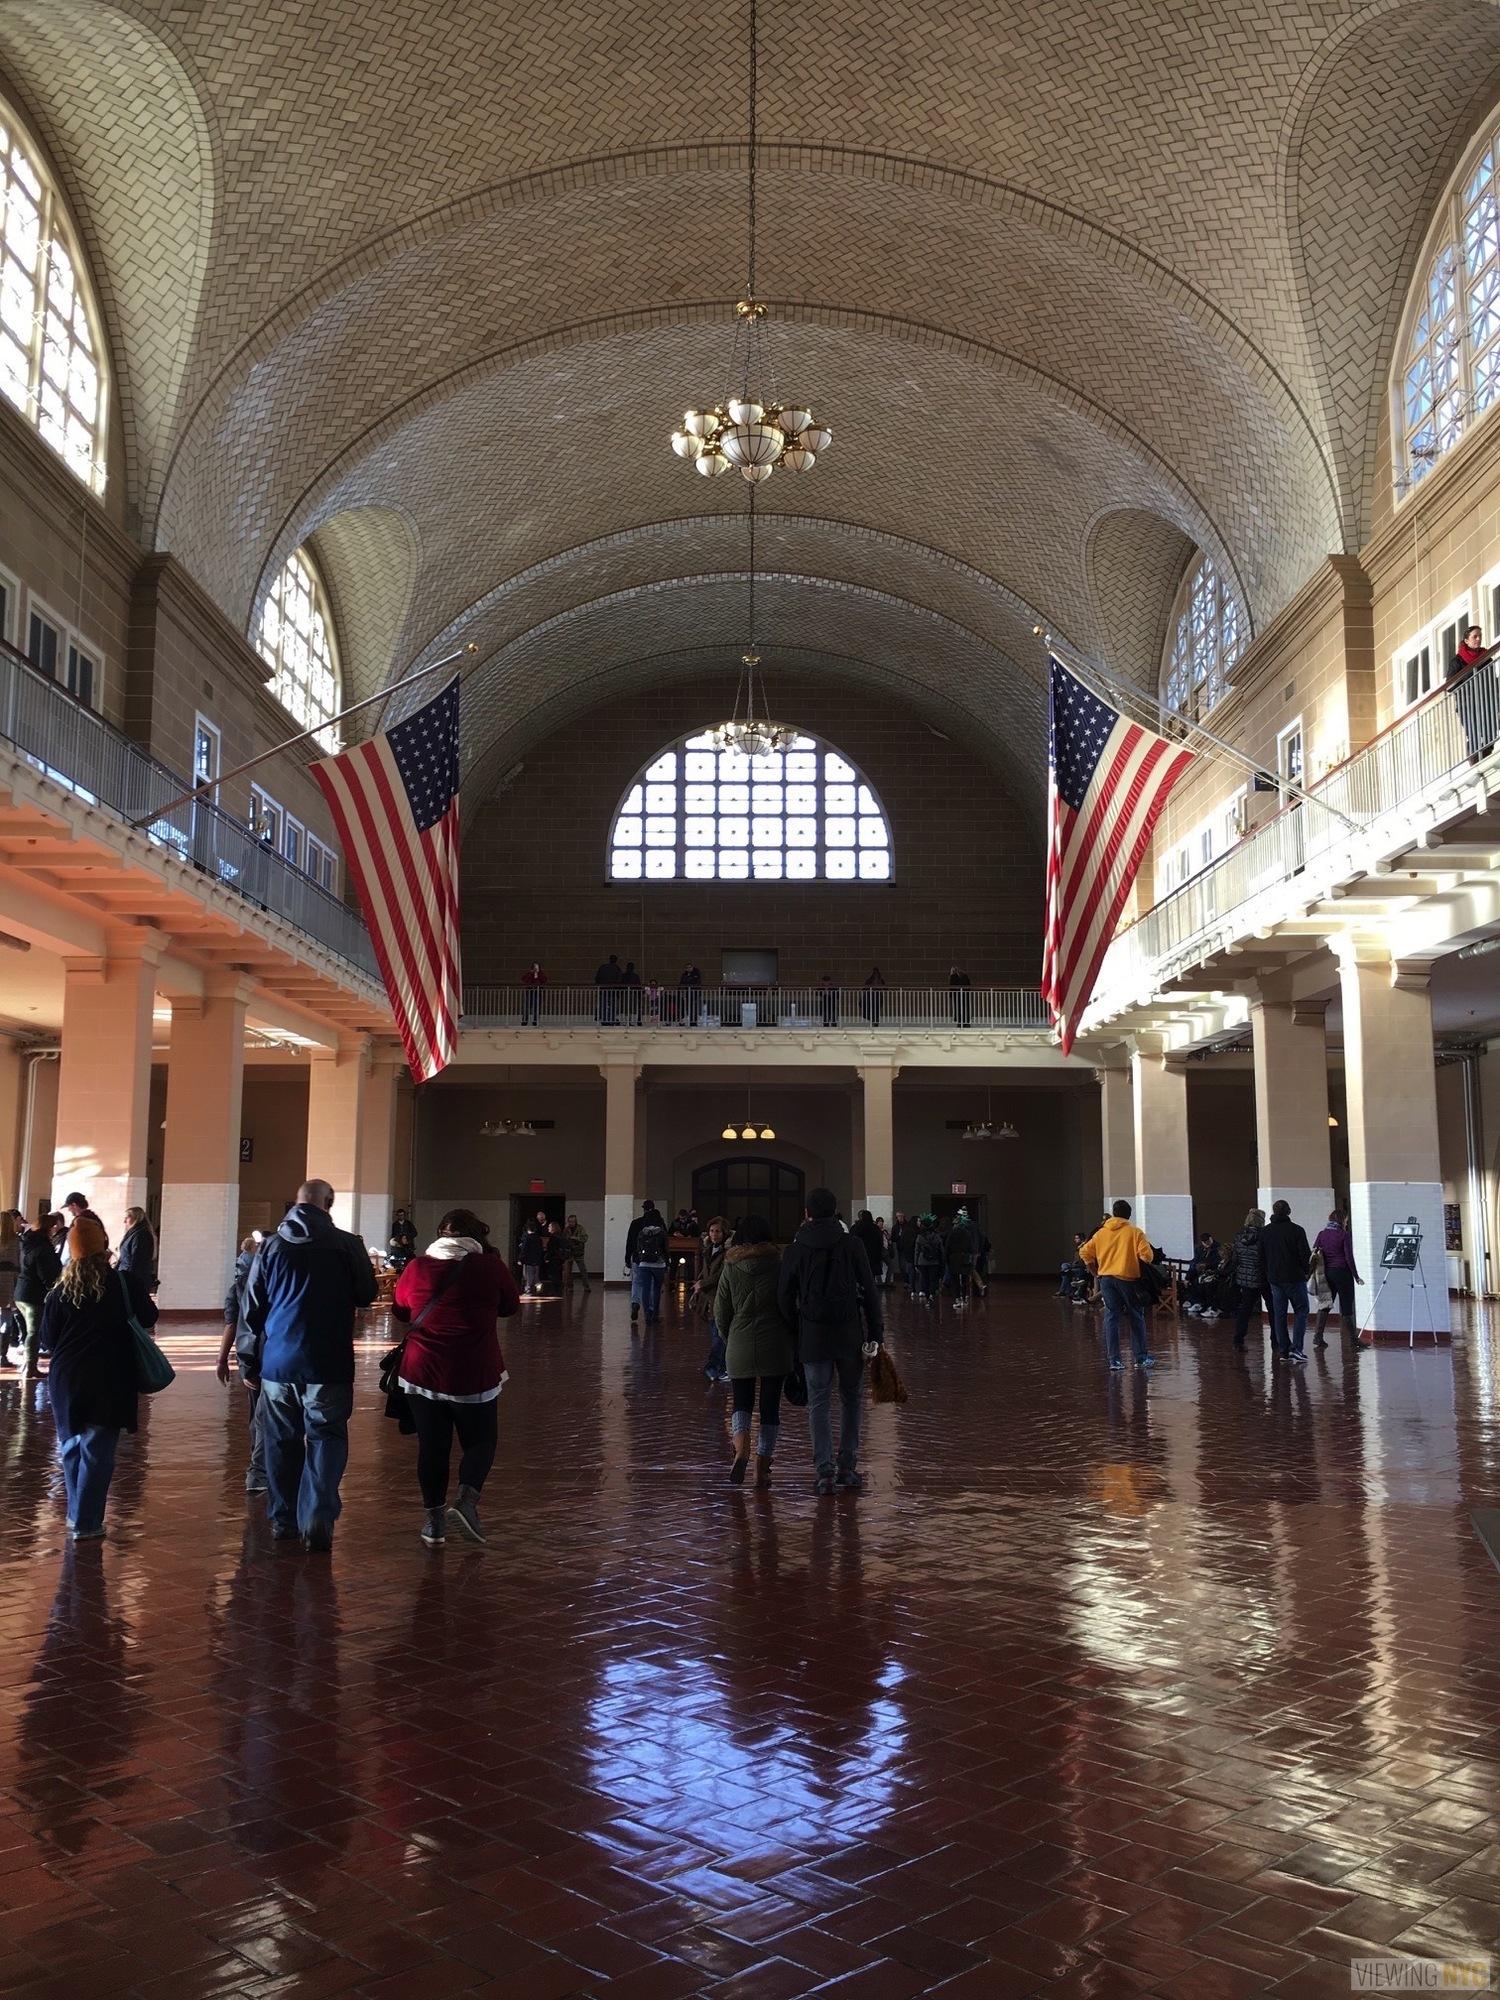 Ellis Island Nation Immigration Museum